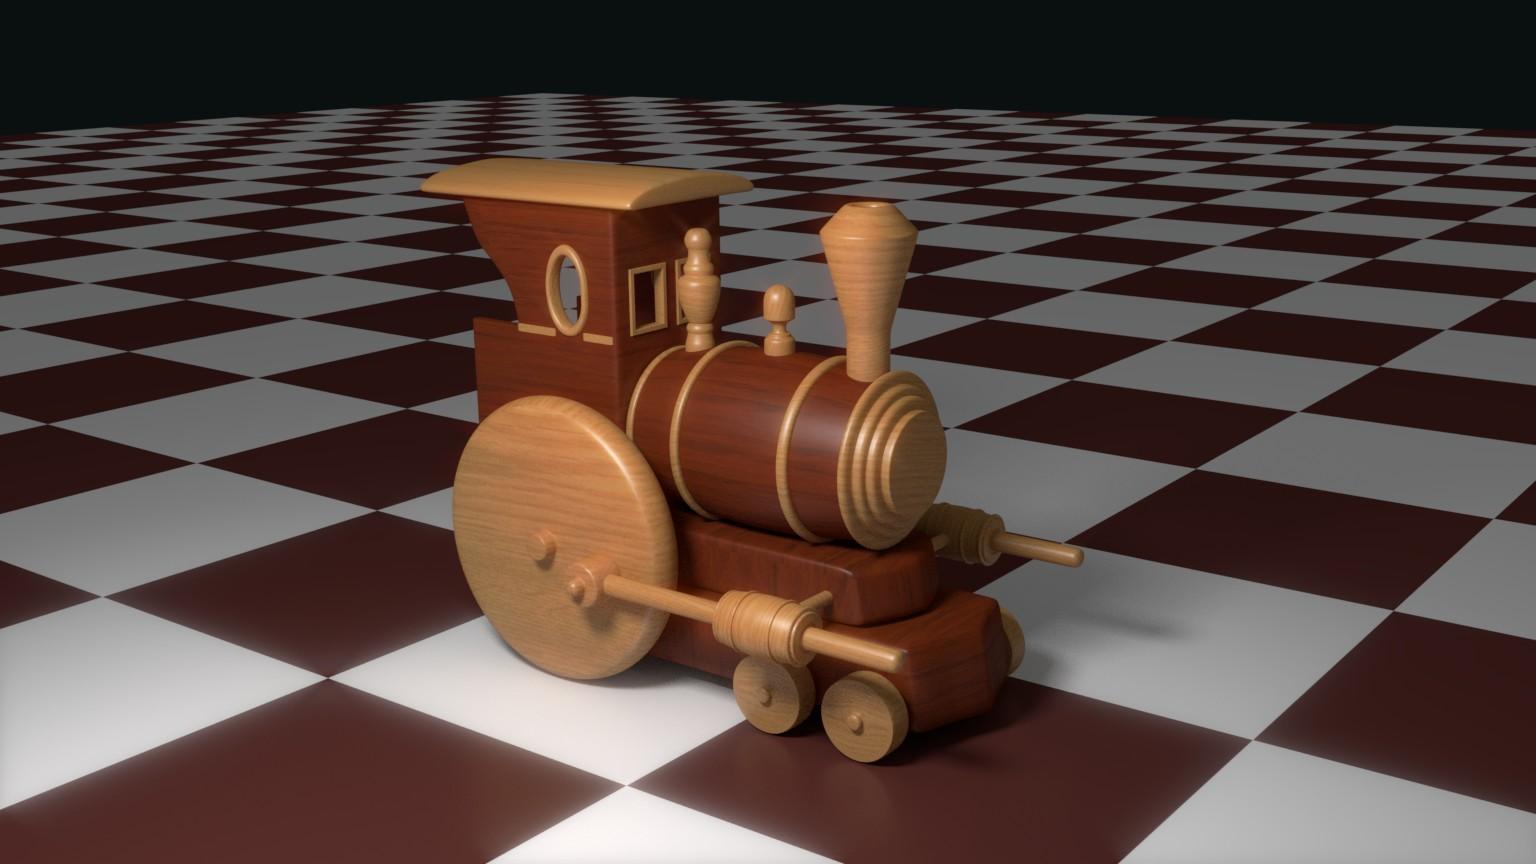 Tren madera juguete 2-trenecito_3.jpg